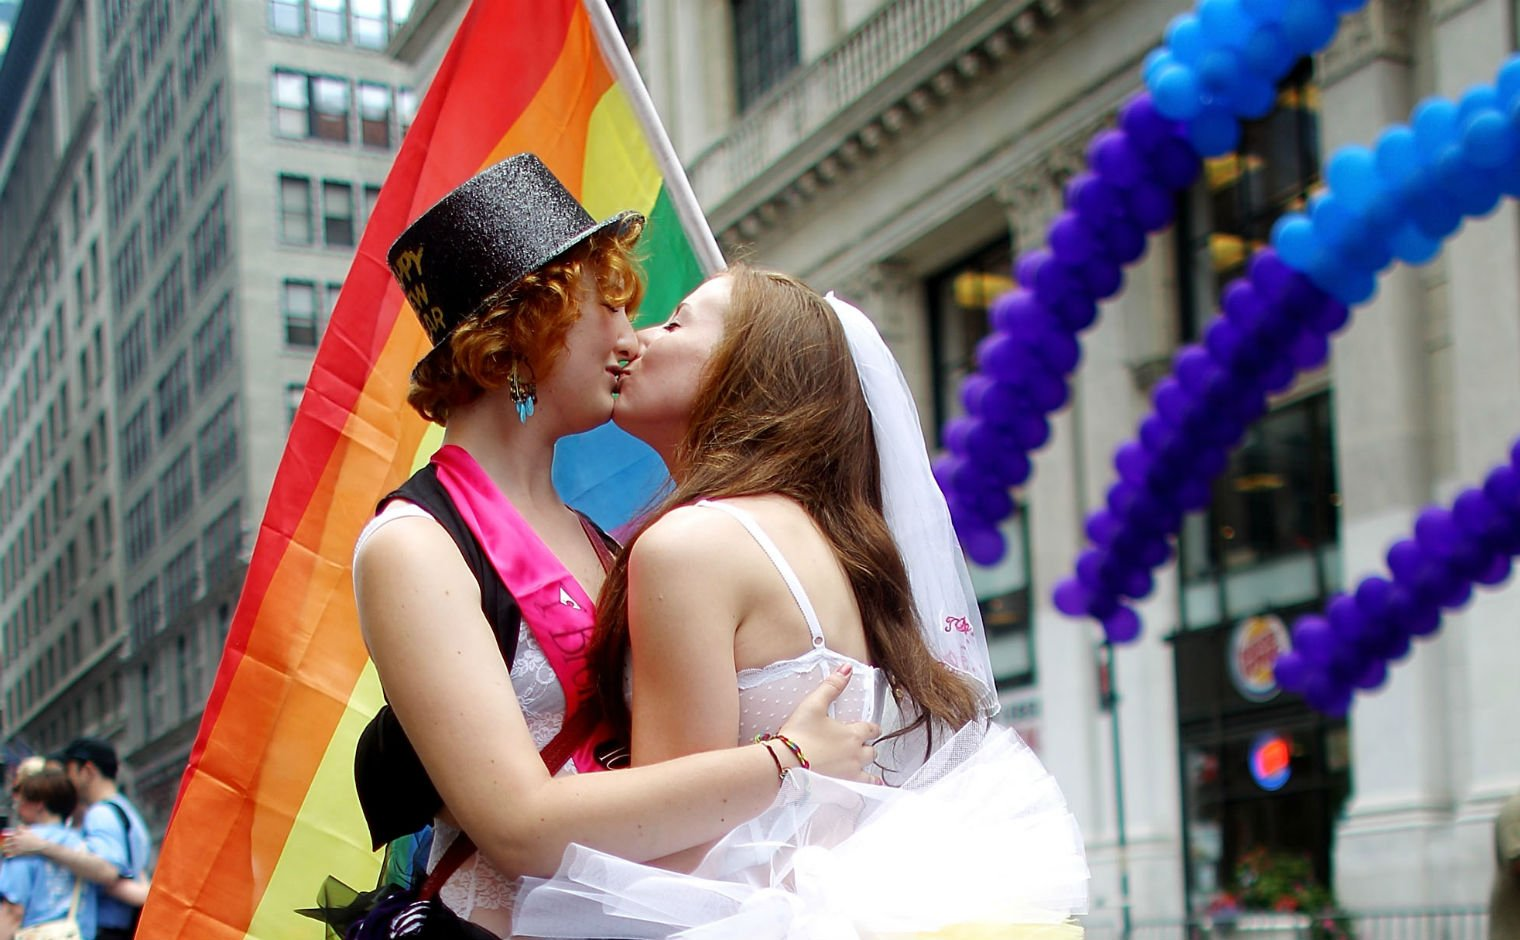 List of gay lesbian or bisexual people